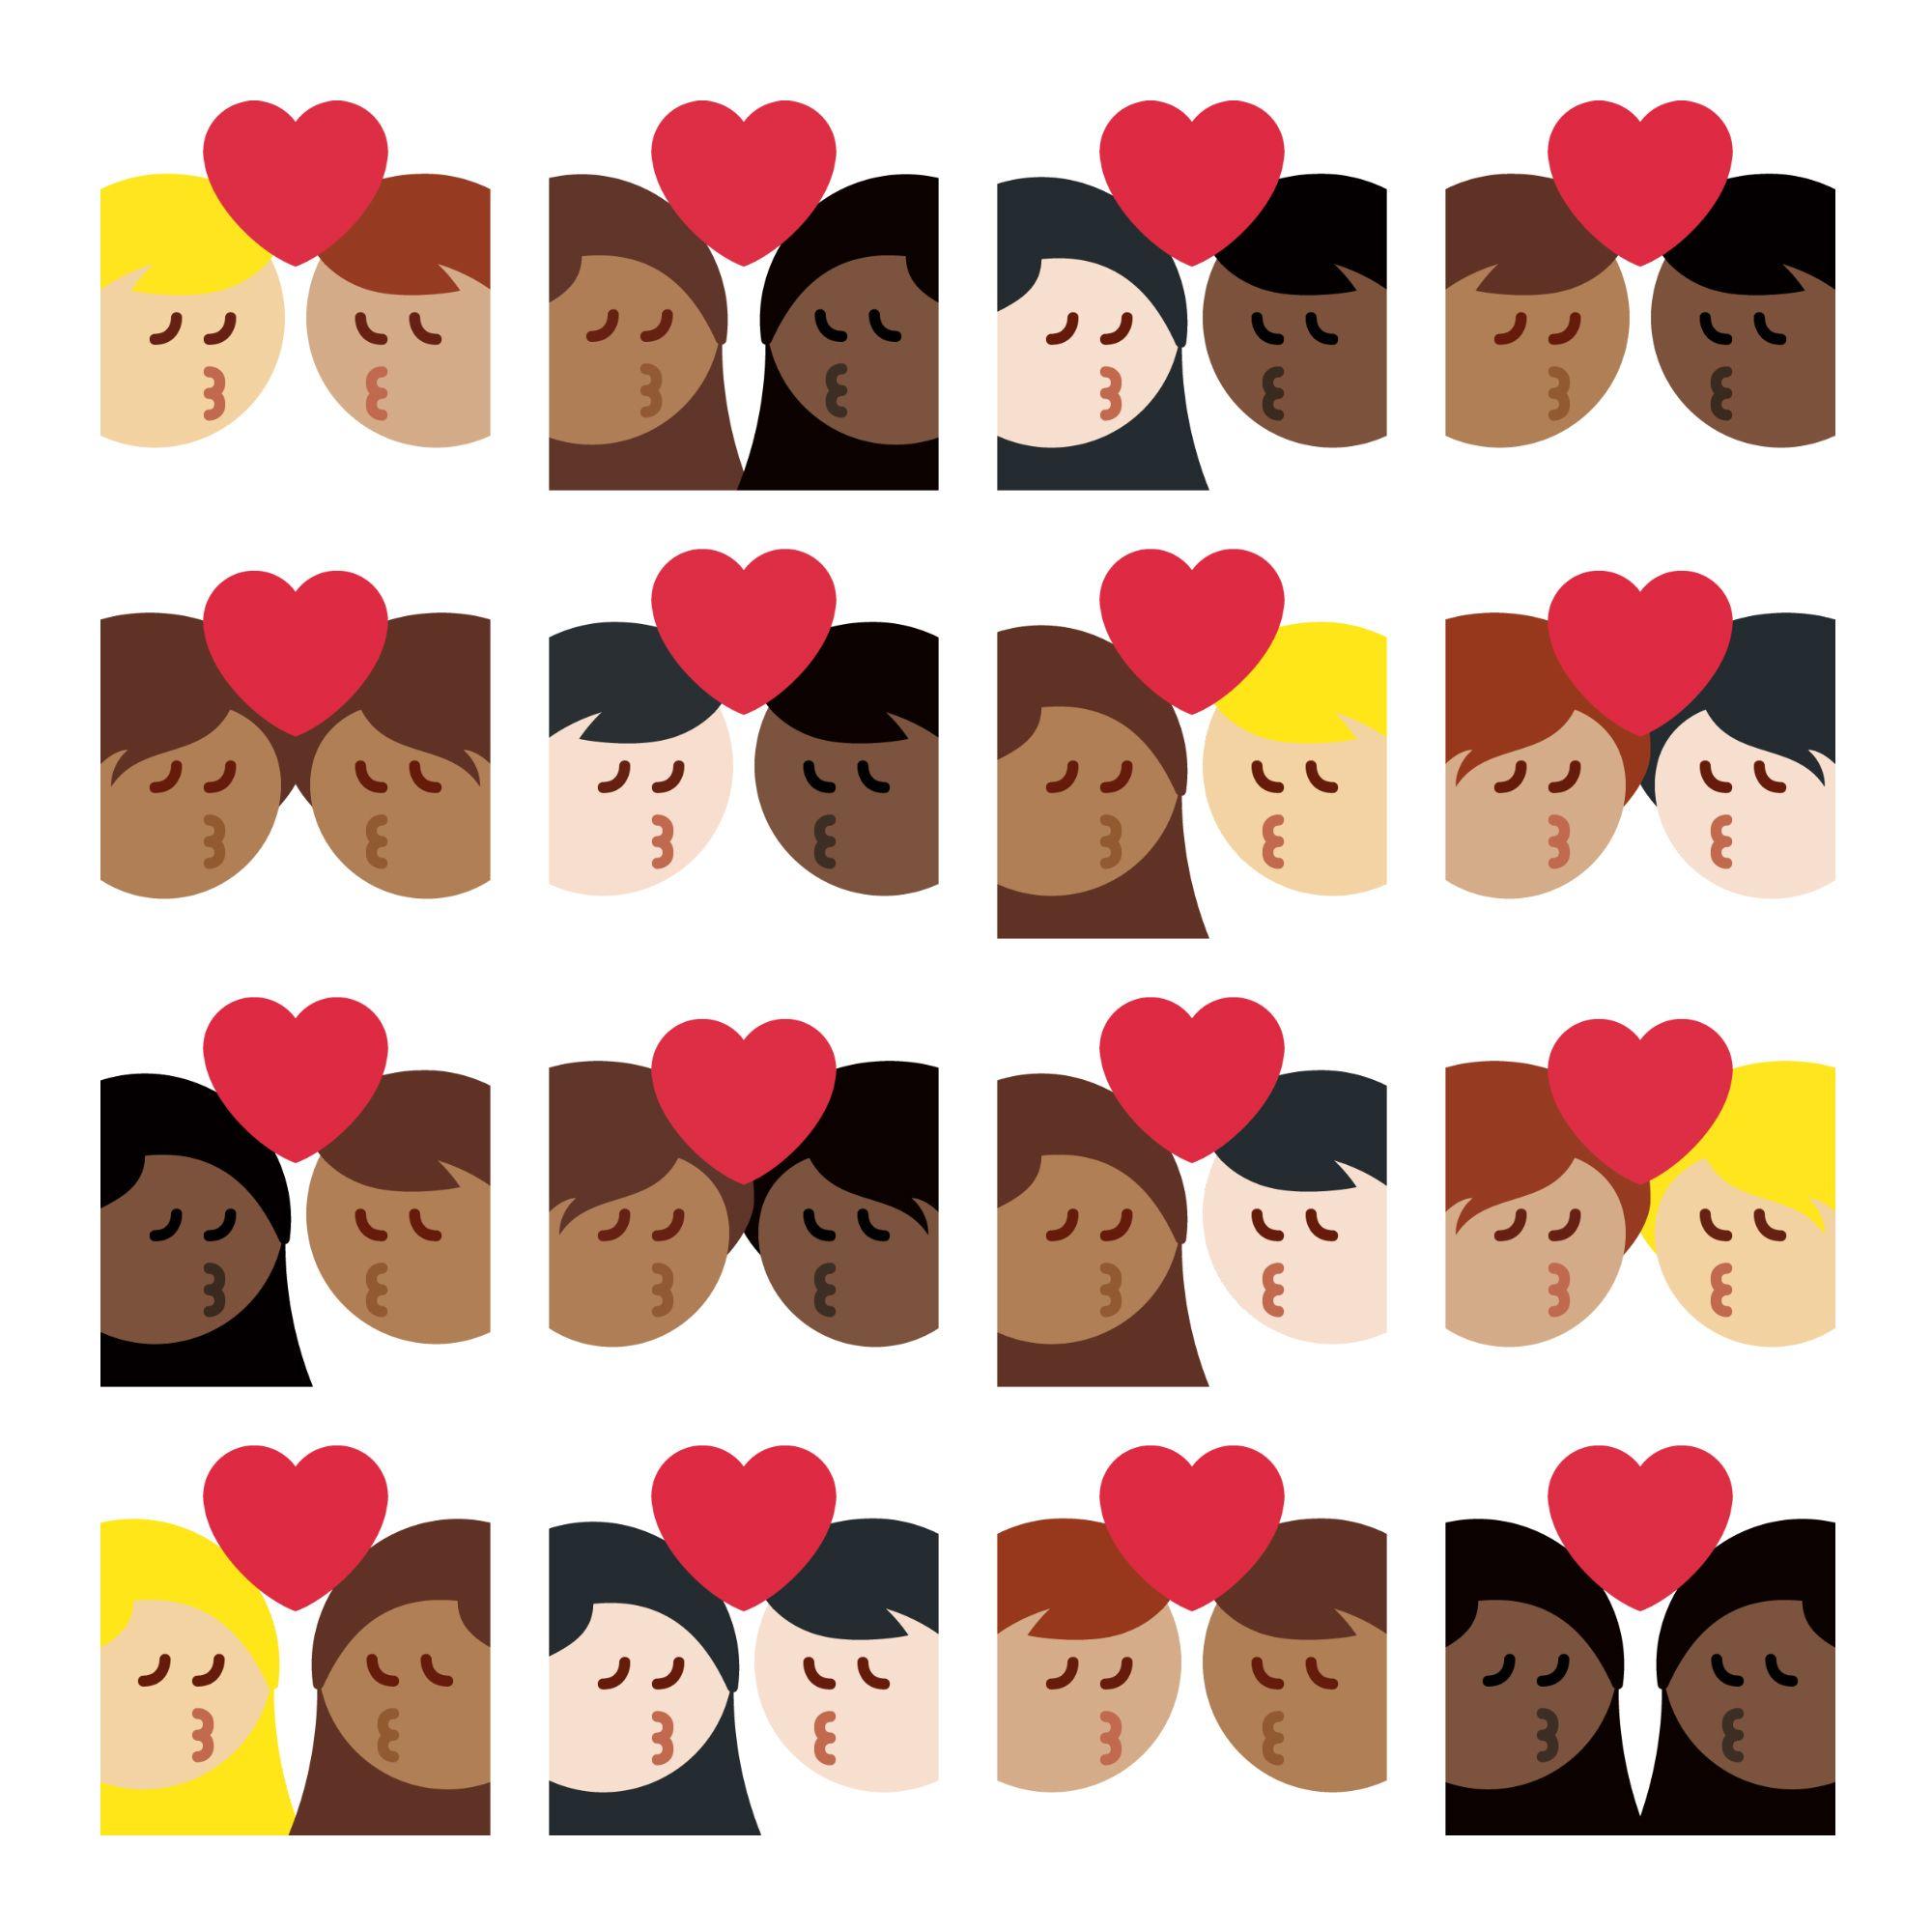 Emojipedia-Twemoji-13_1-New-Kissing-People-Emojis